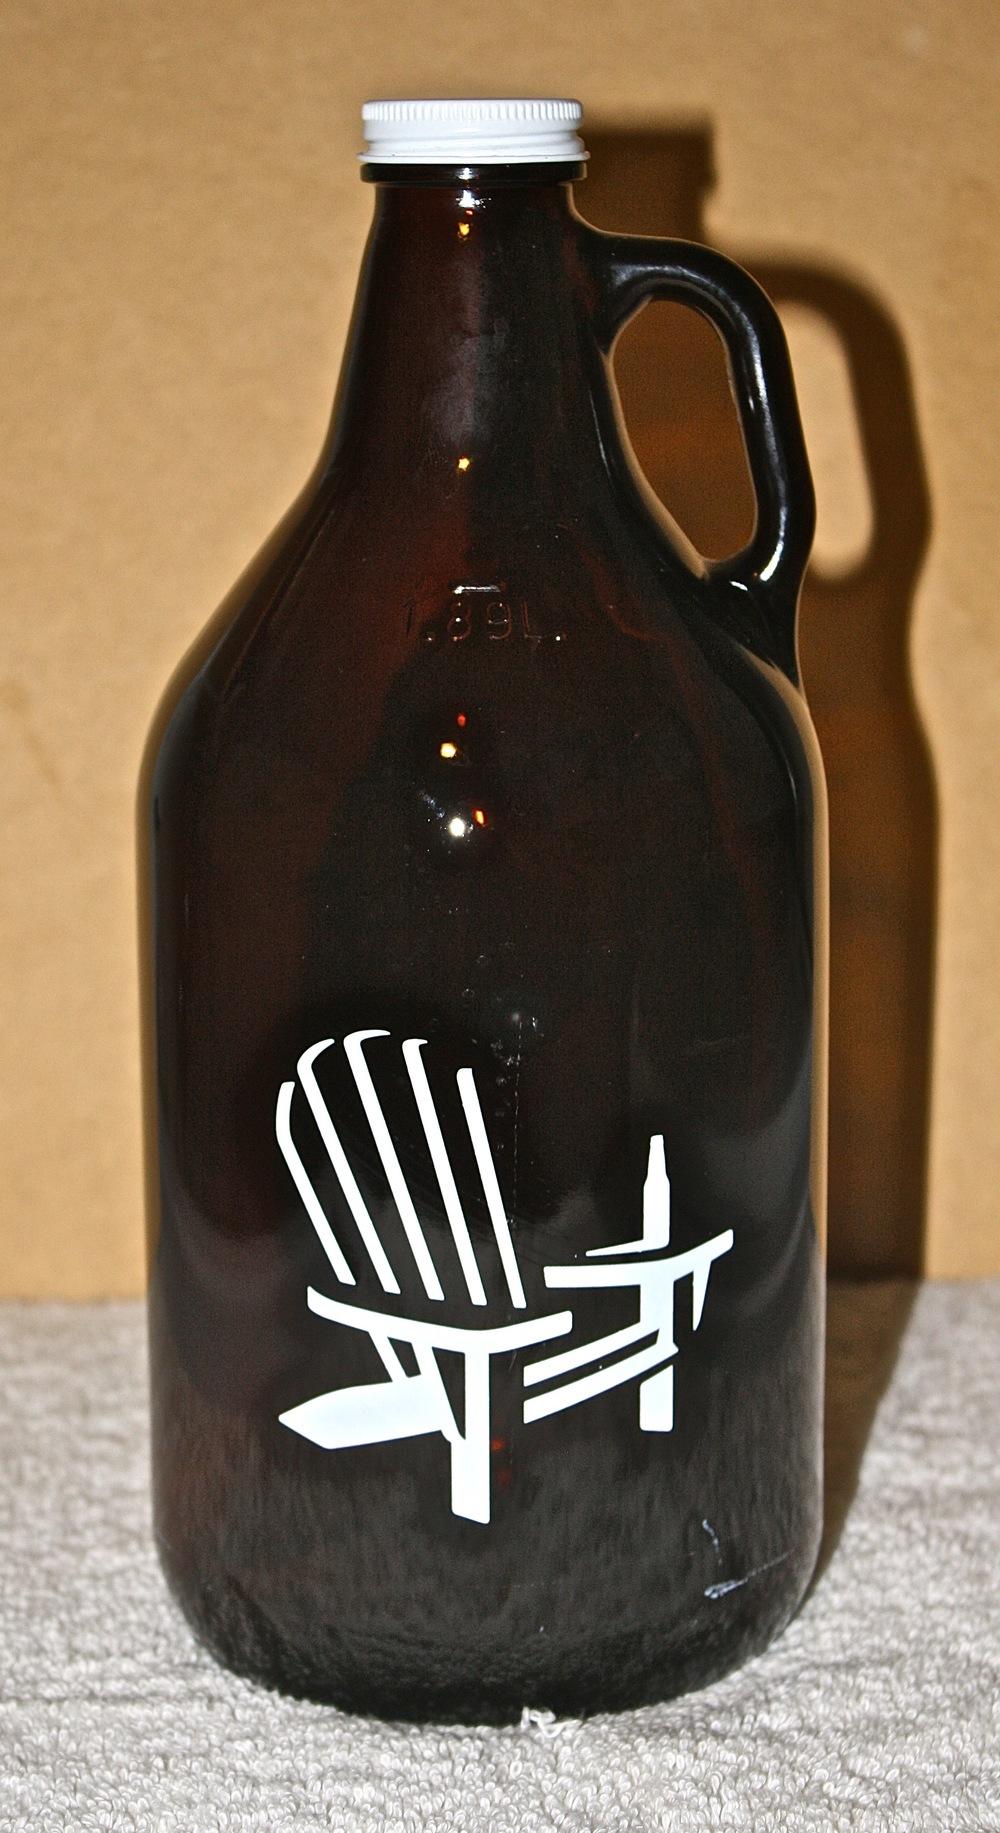 GR - Muskoka Brewery (ON).jpg